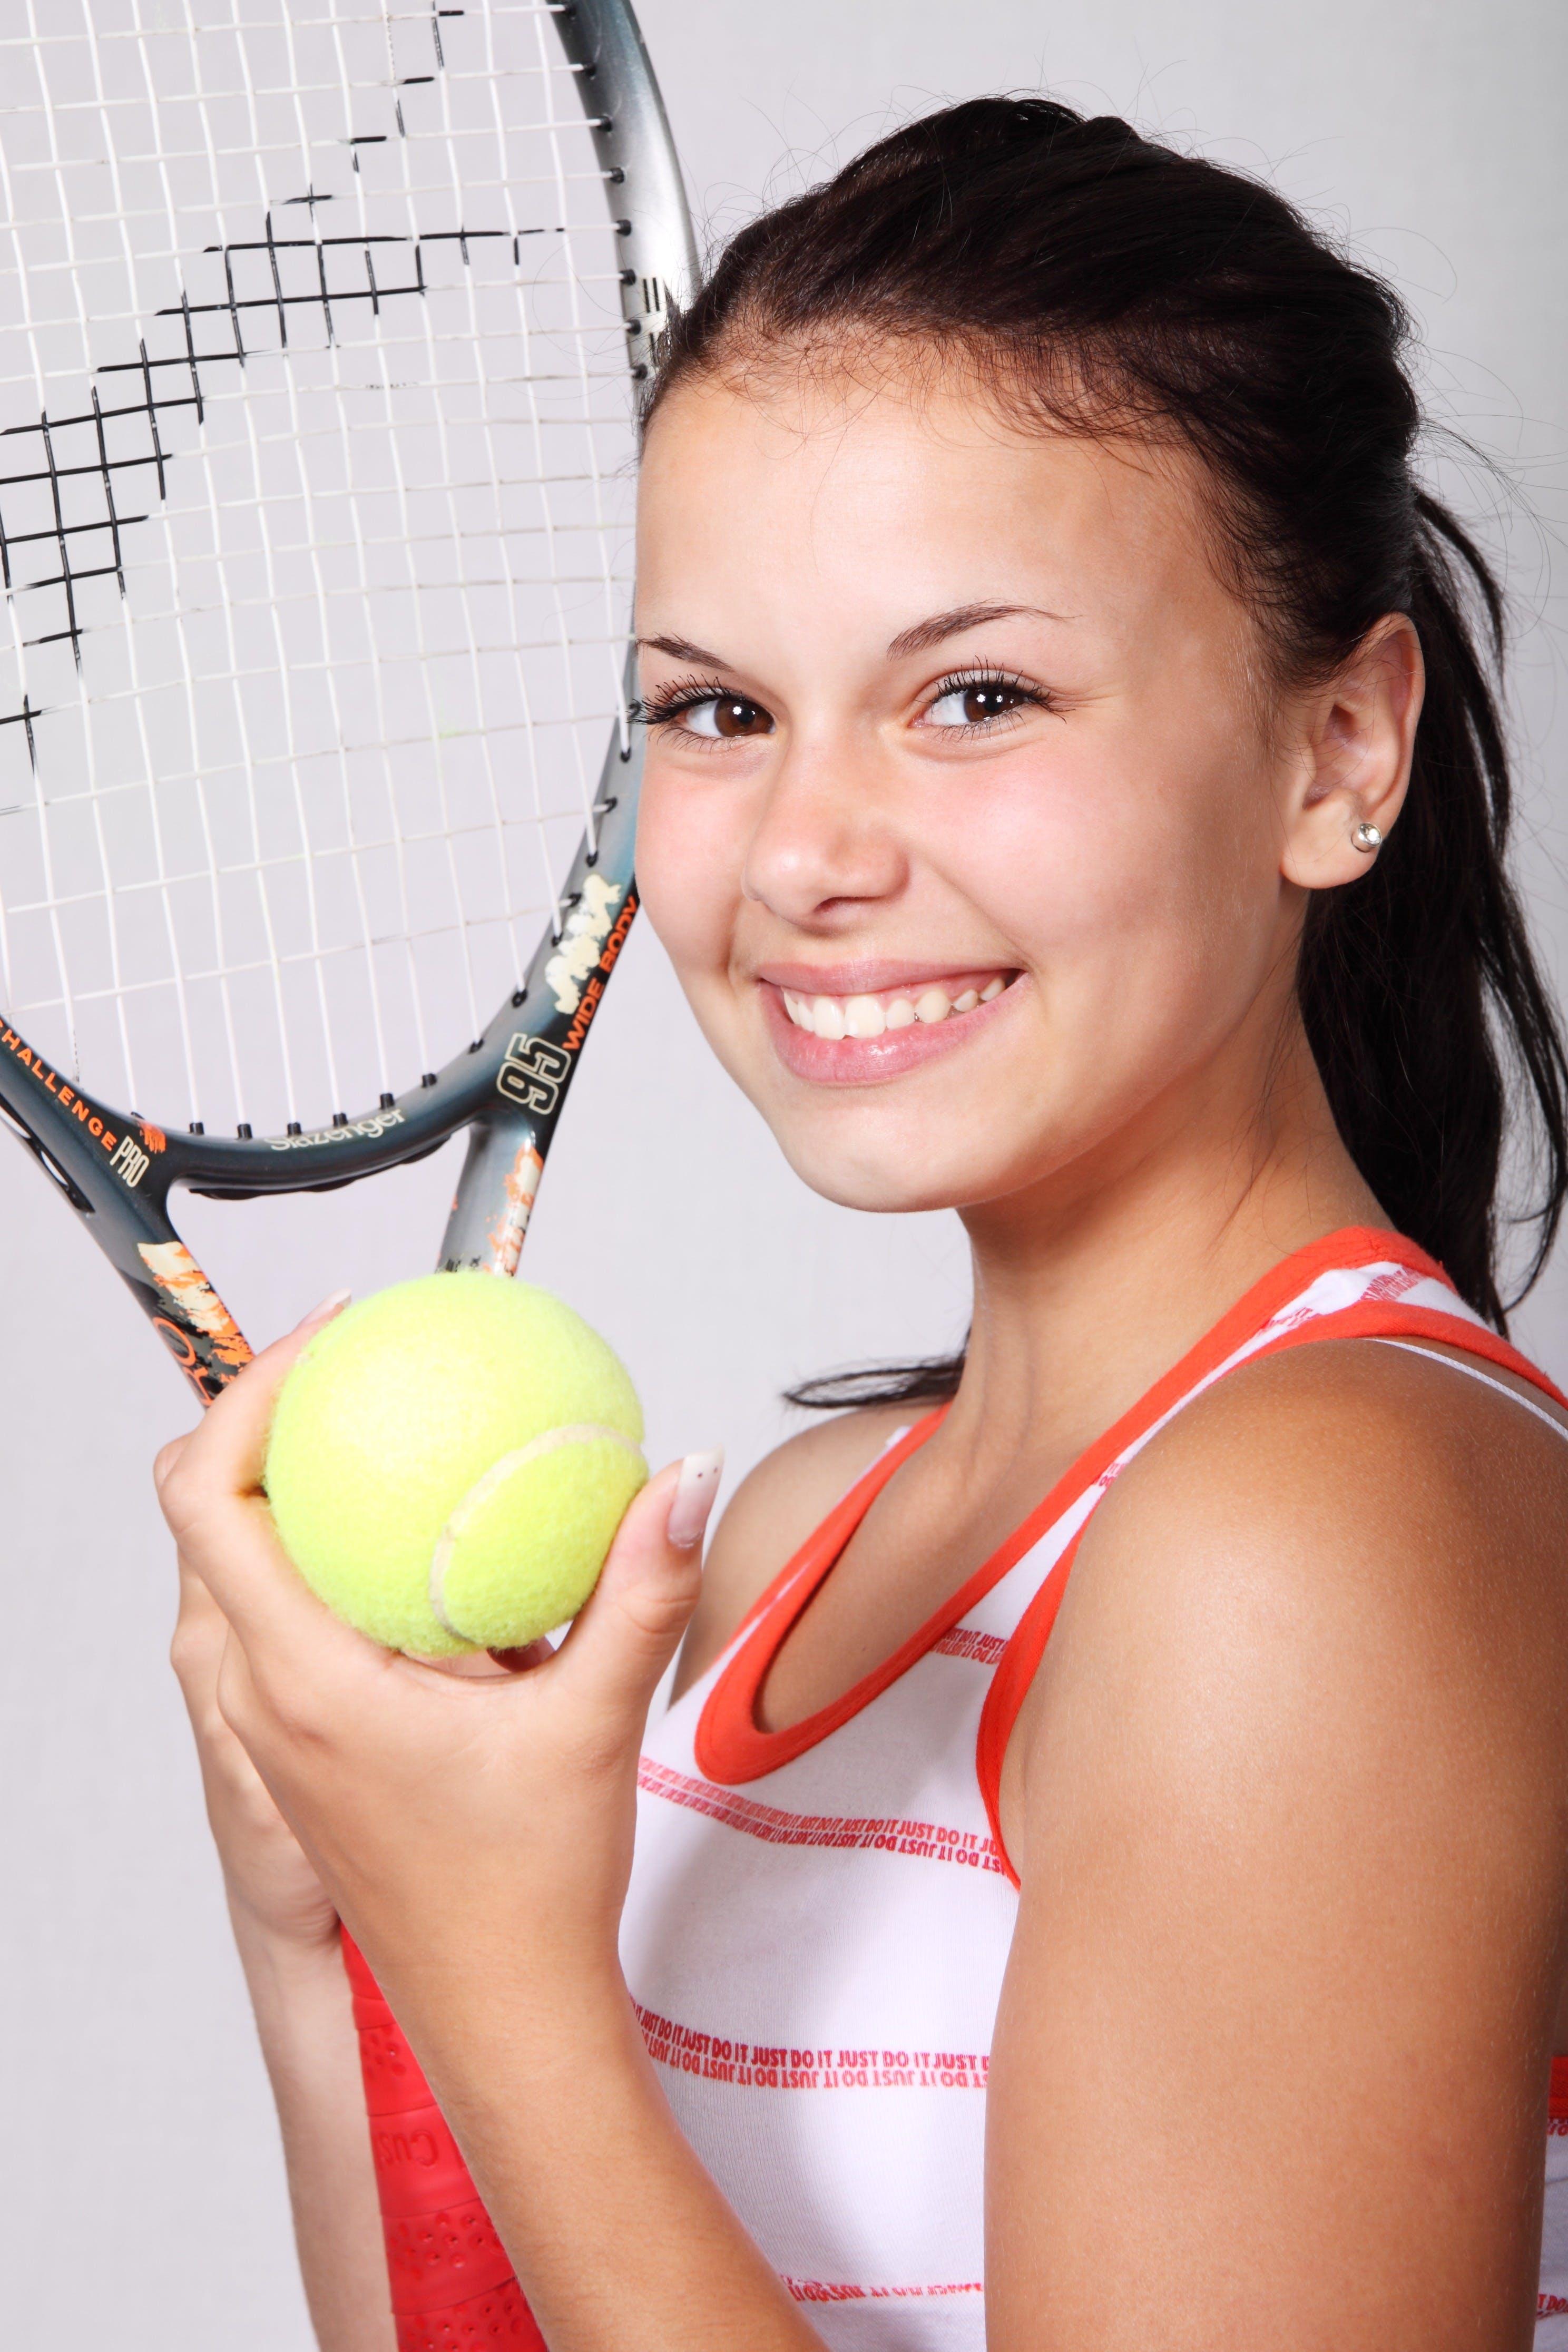 Girl in White and Orange Stripe Tank Top Holding Black Tennis Racket